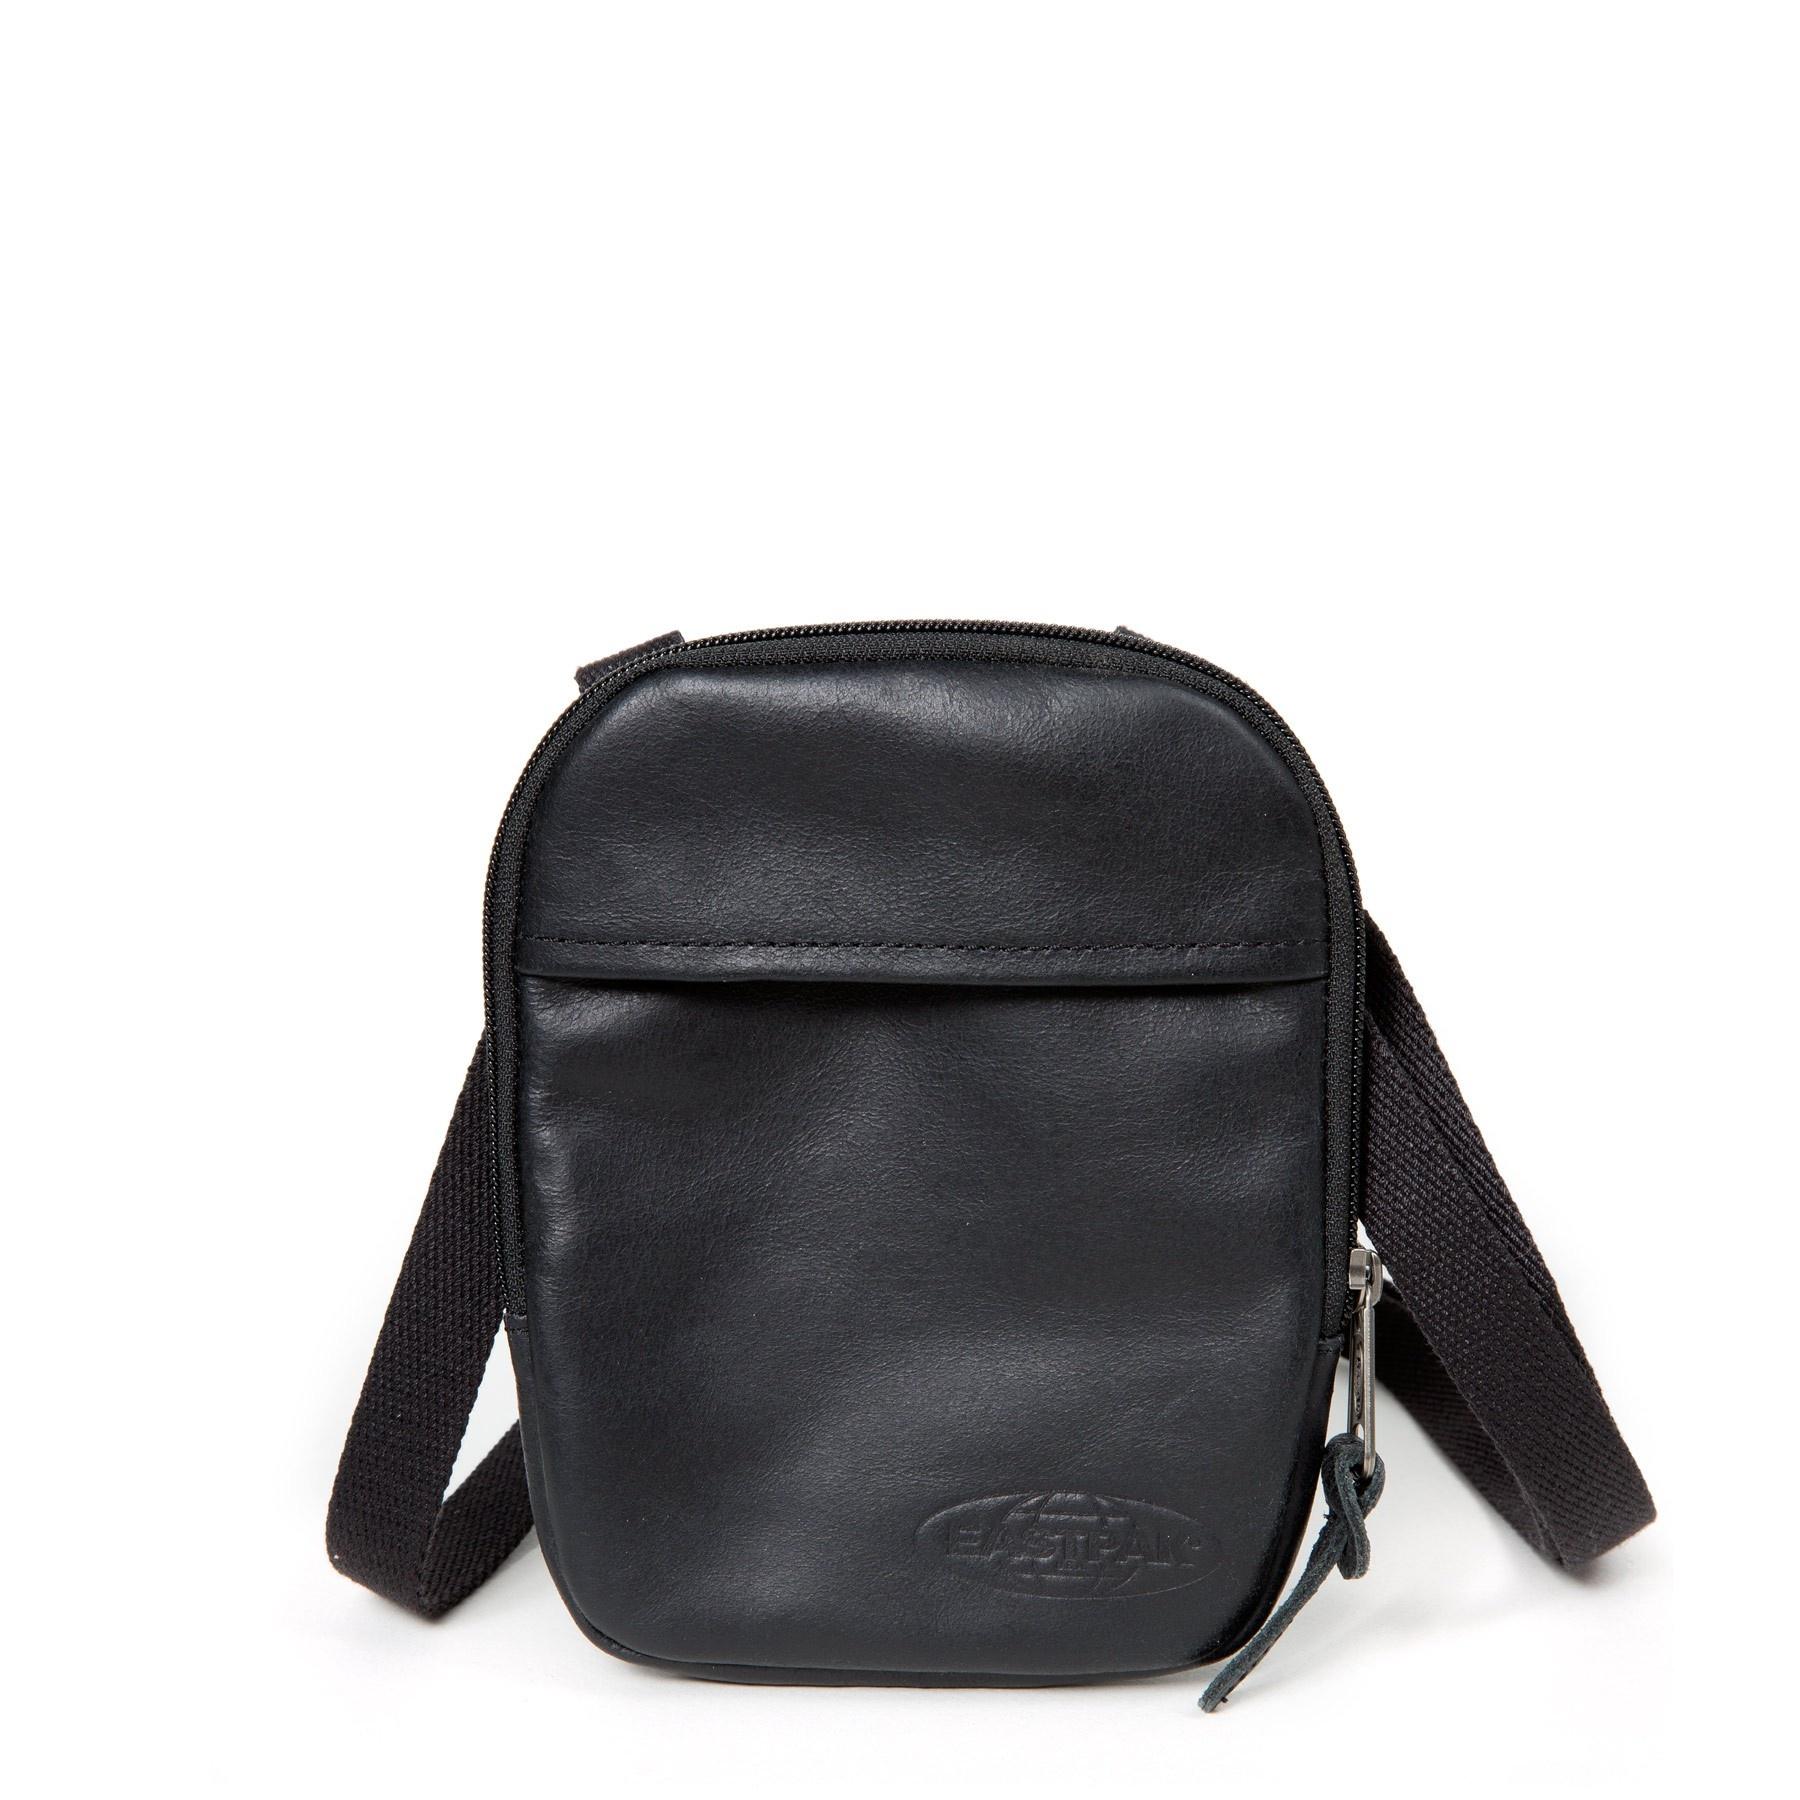 Eastpak Leather It Buddy Ink Black rZrX0